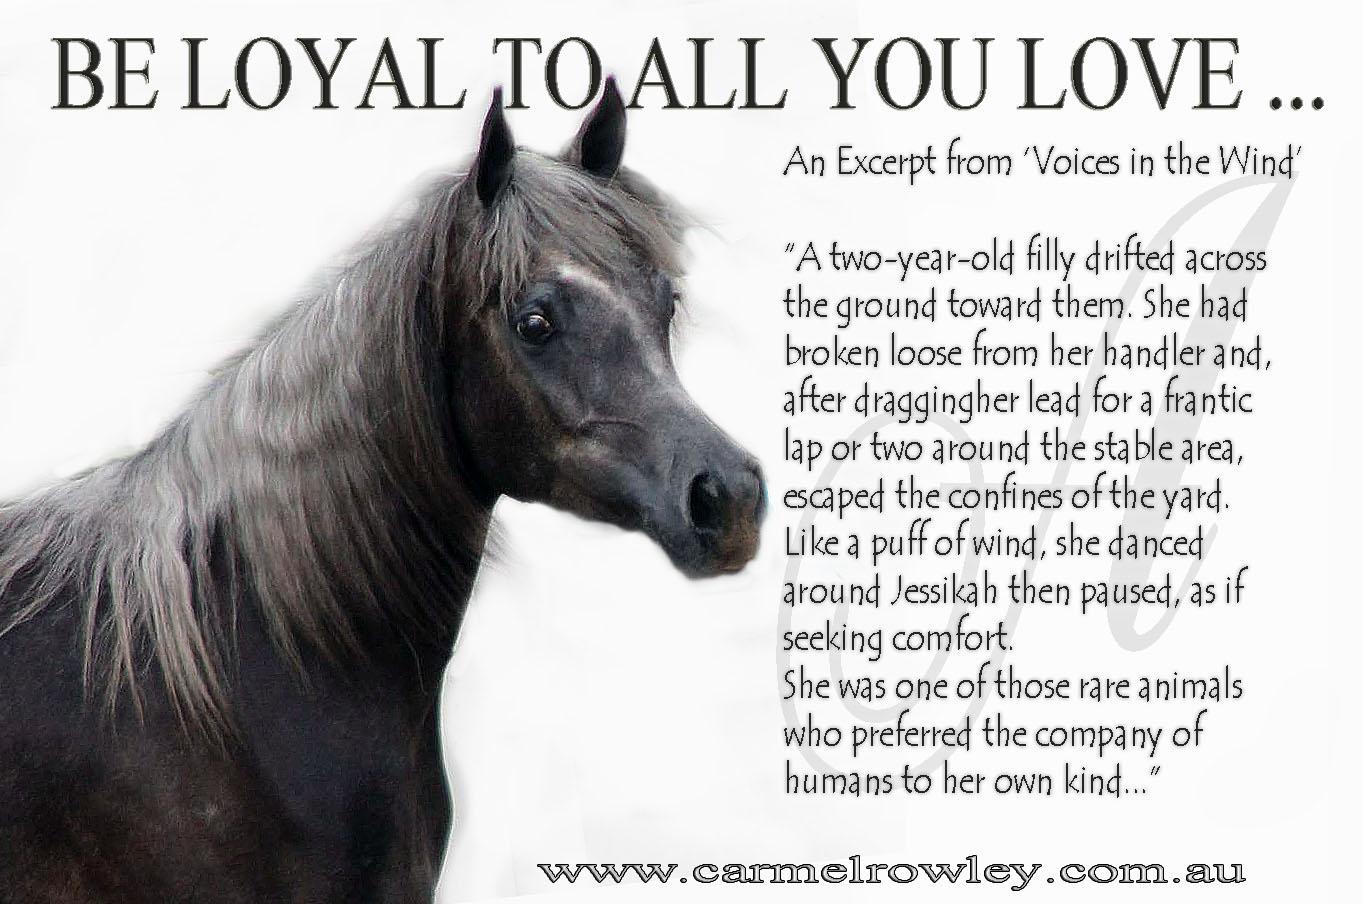 A Special Christmas Loyalty Love And Horses Carmelrowley Com Au